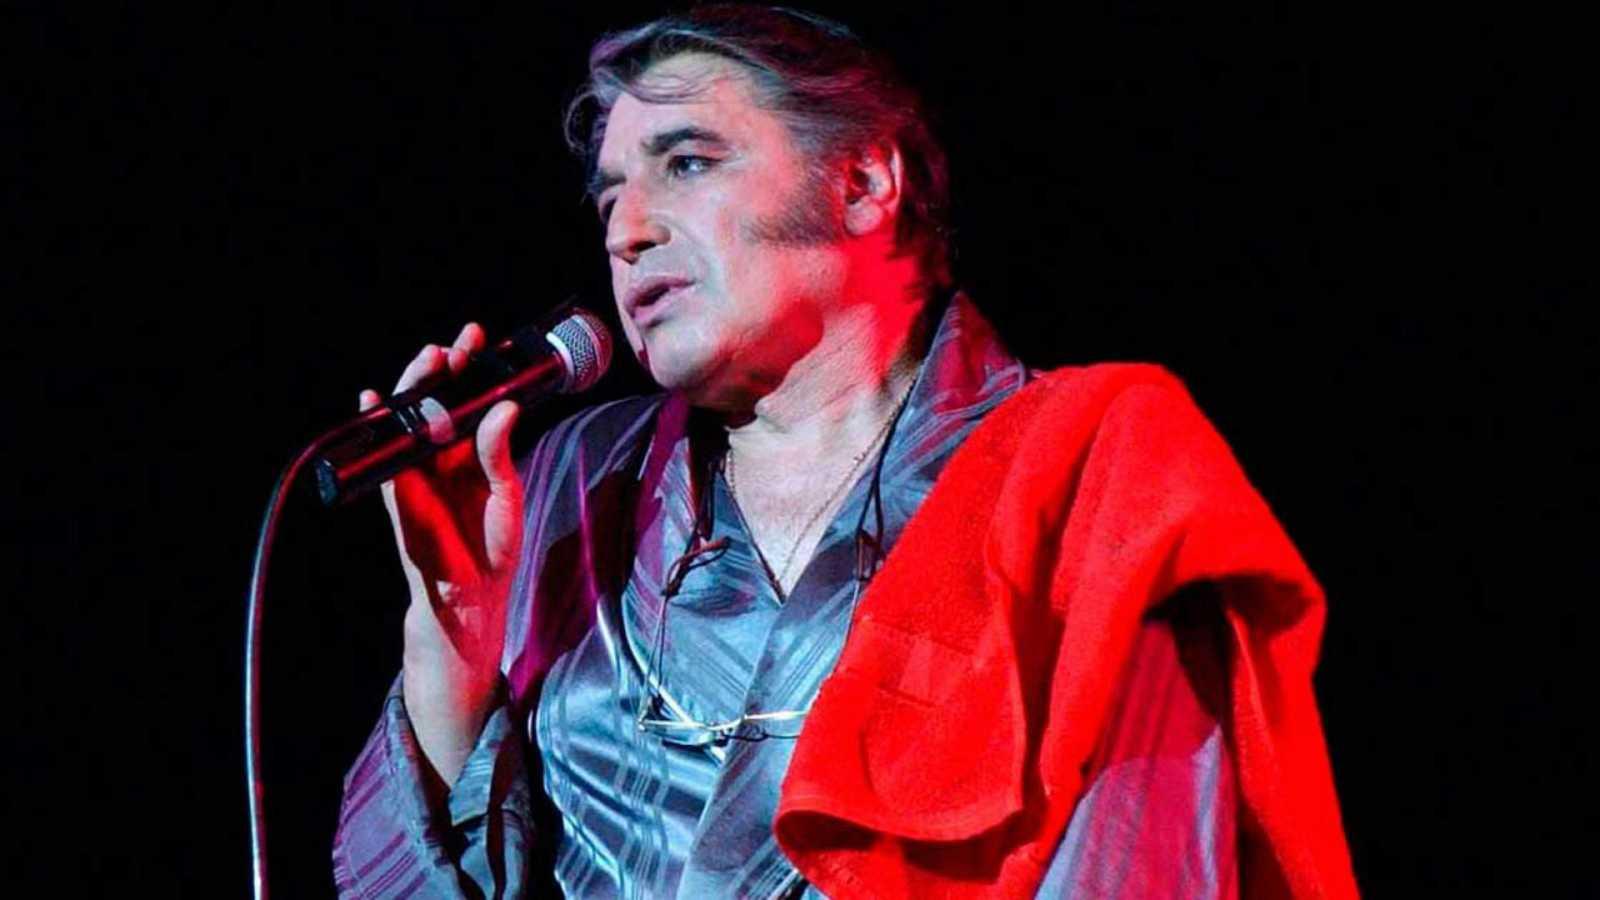 Gitanos - Un mito argentino: Sandro 'El Gitano' - 17/05/20 - escuchar ahora